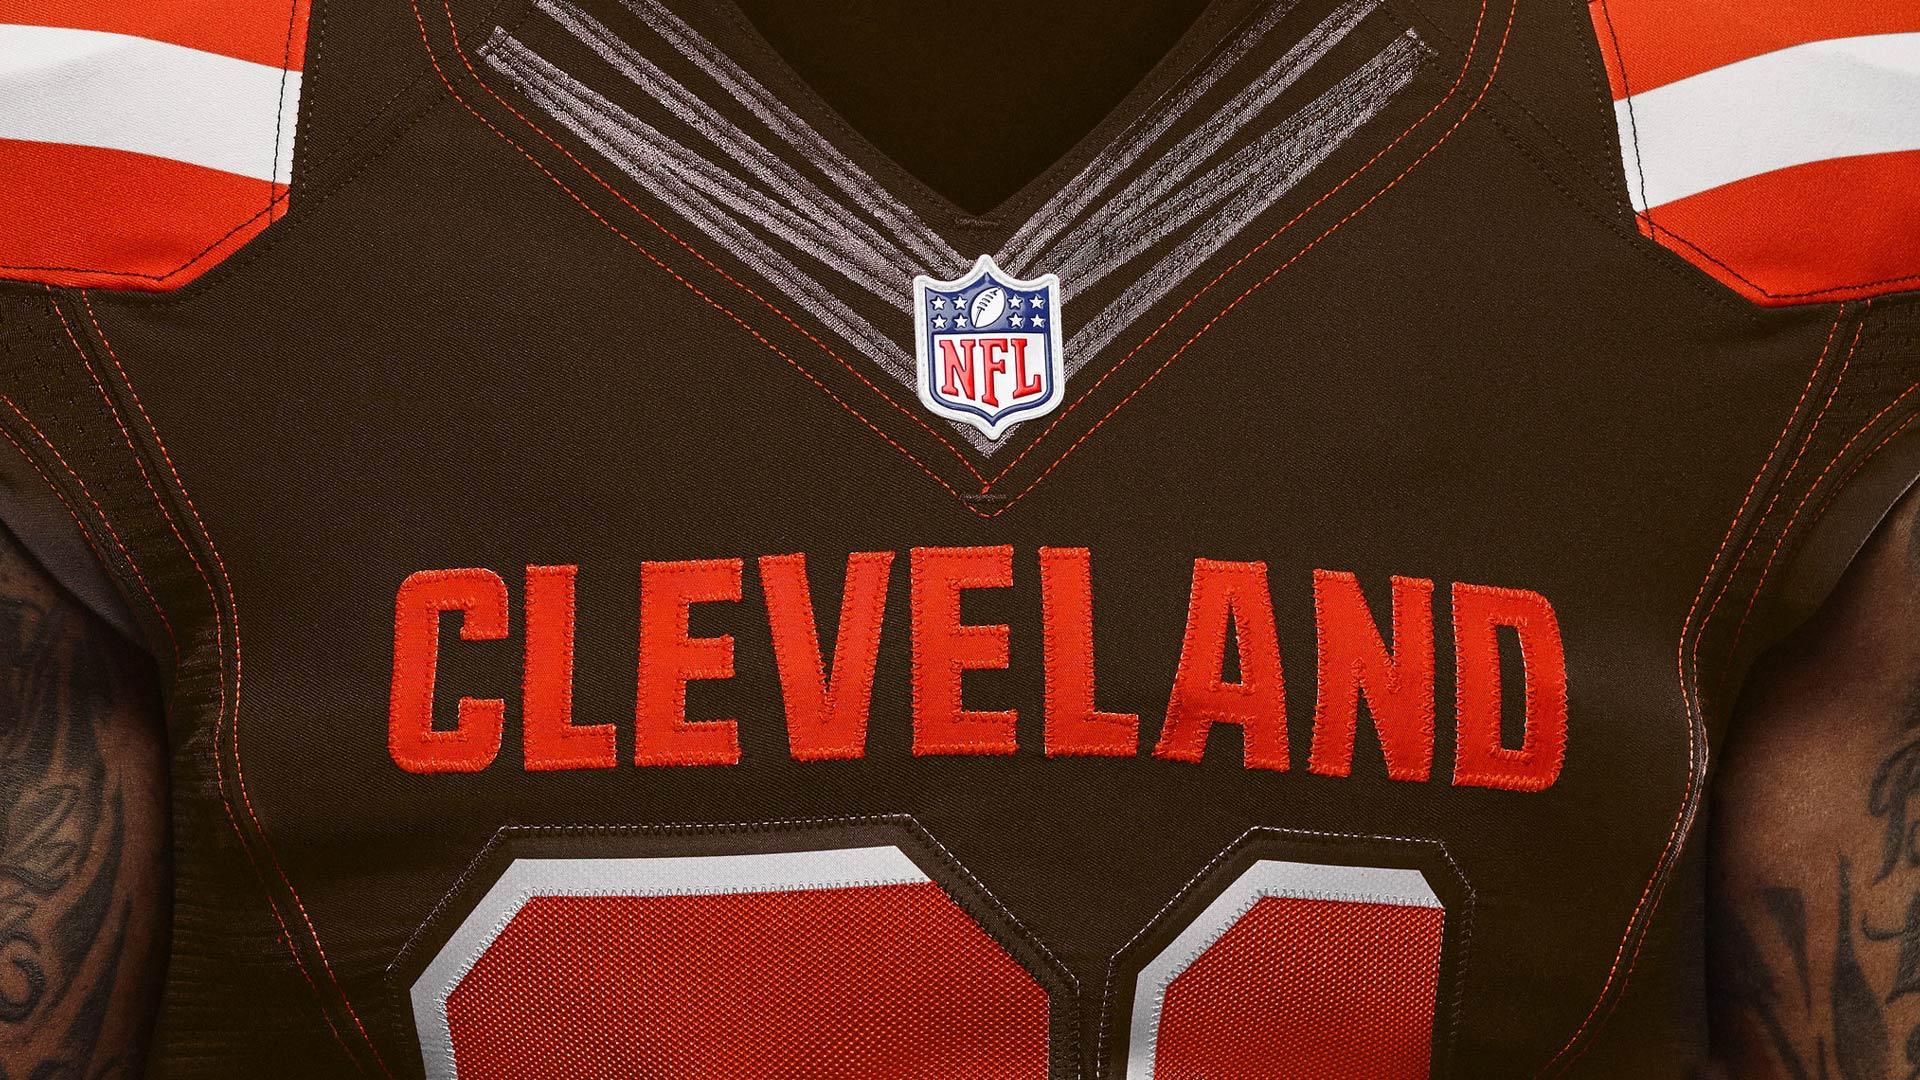 Nike Quotes Wallpaper Hd Basketball Cleveland Browns Wallpapers Hd Pixelstalk Net